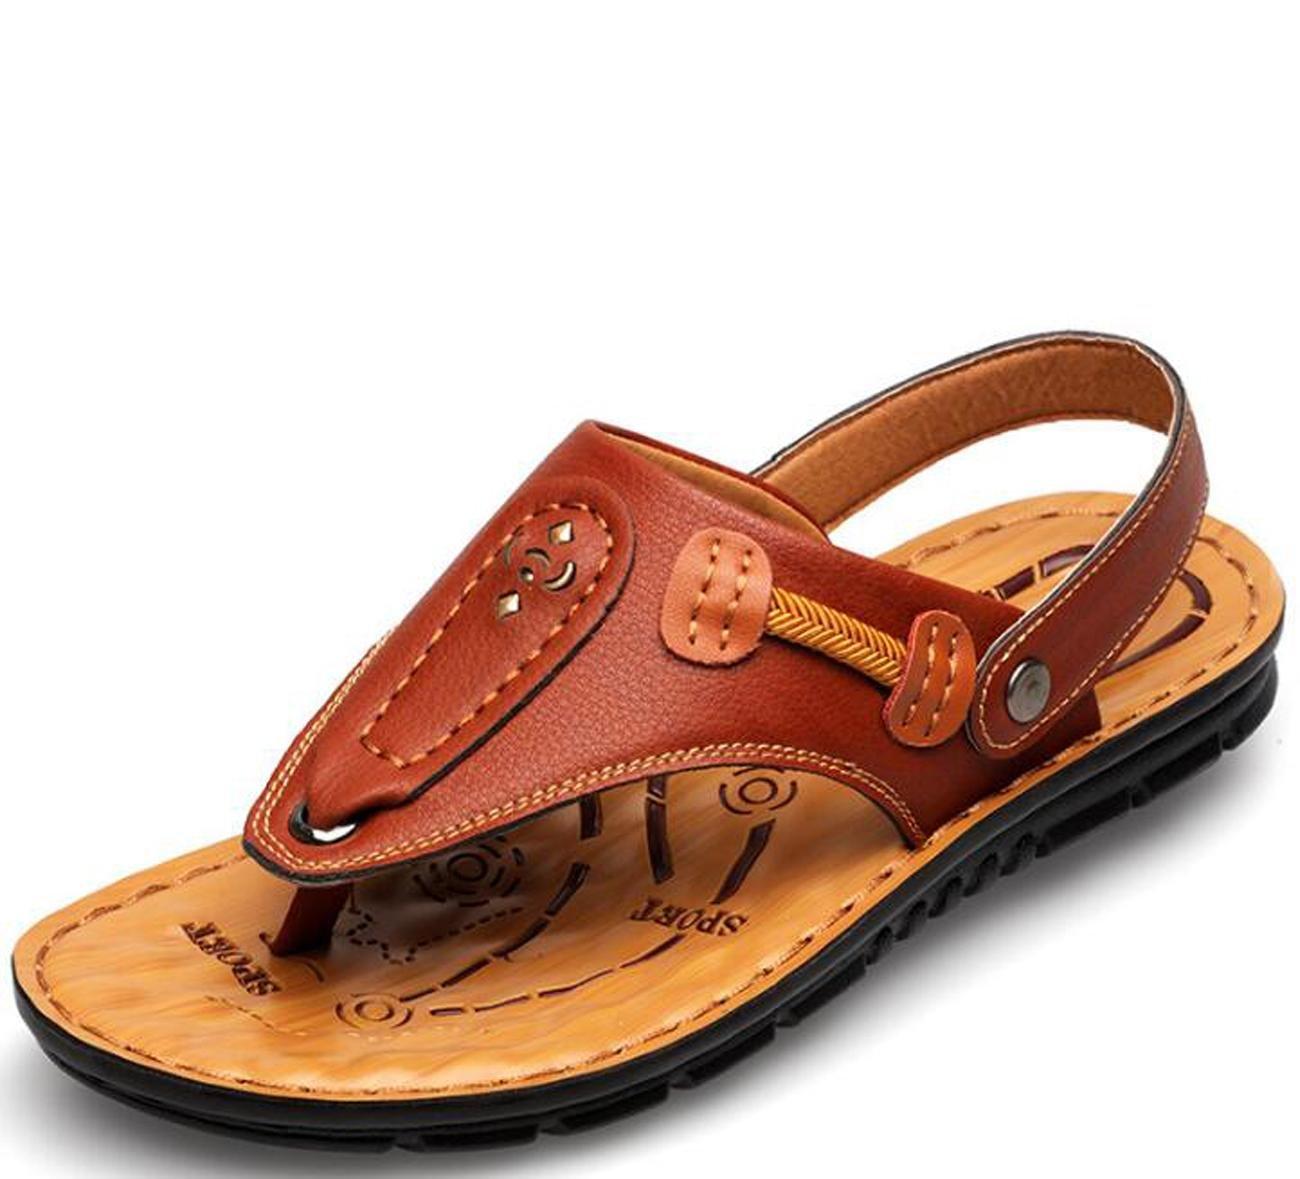 Beauqueen Dual-Use Man's Outdoors Strand Hausschuhe Sandalen Sommer Gesunde Soft Outsoles Clip-Toe Casual Anti-Rutsch-Sport Casual Comforty Schuhe EU Größe 38-44